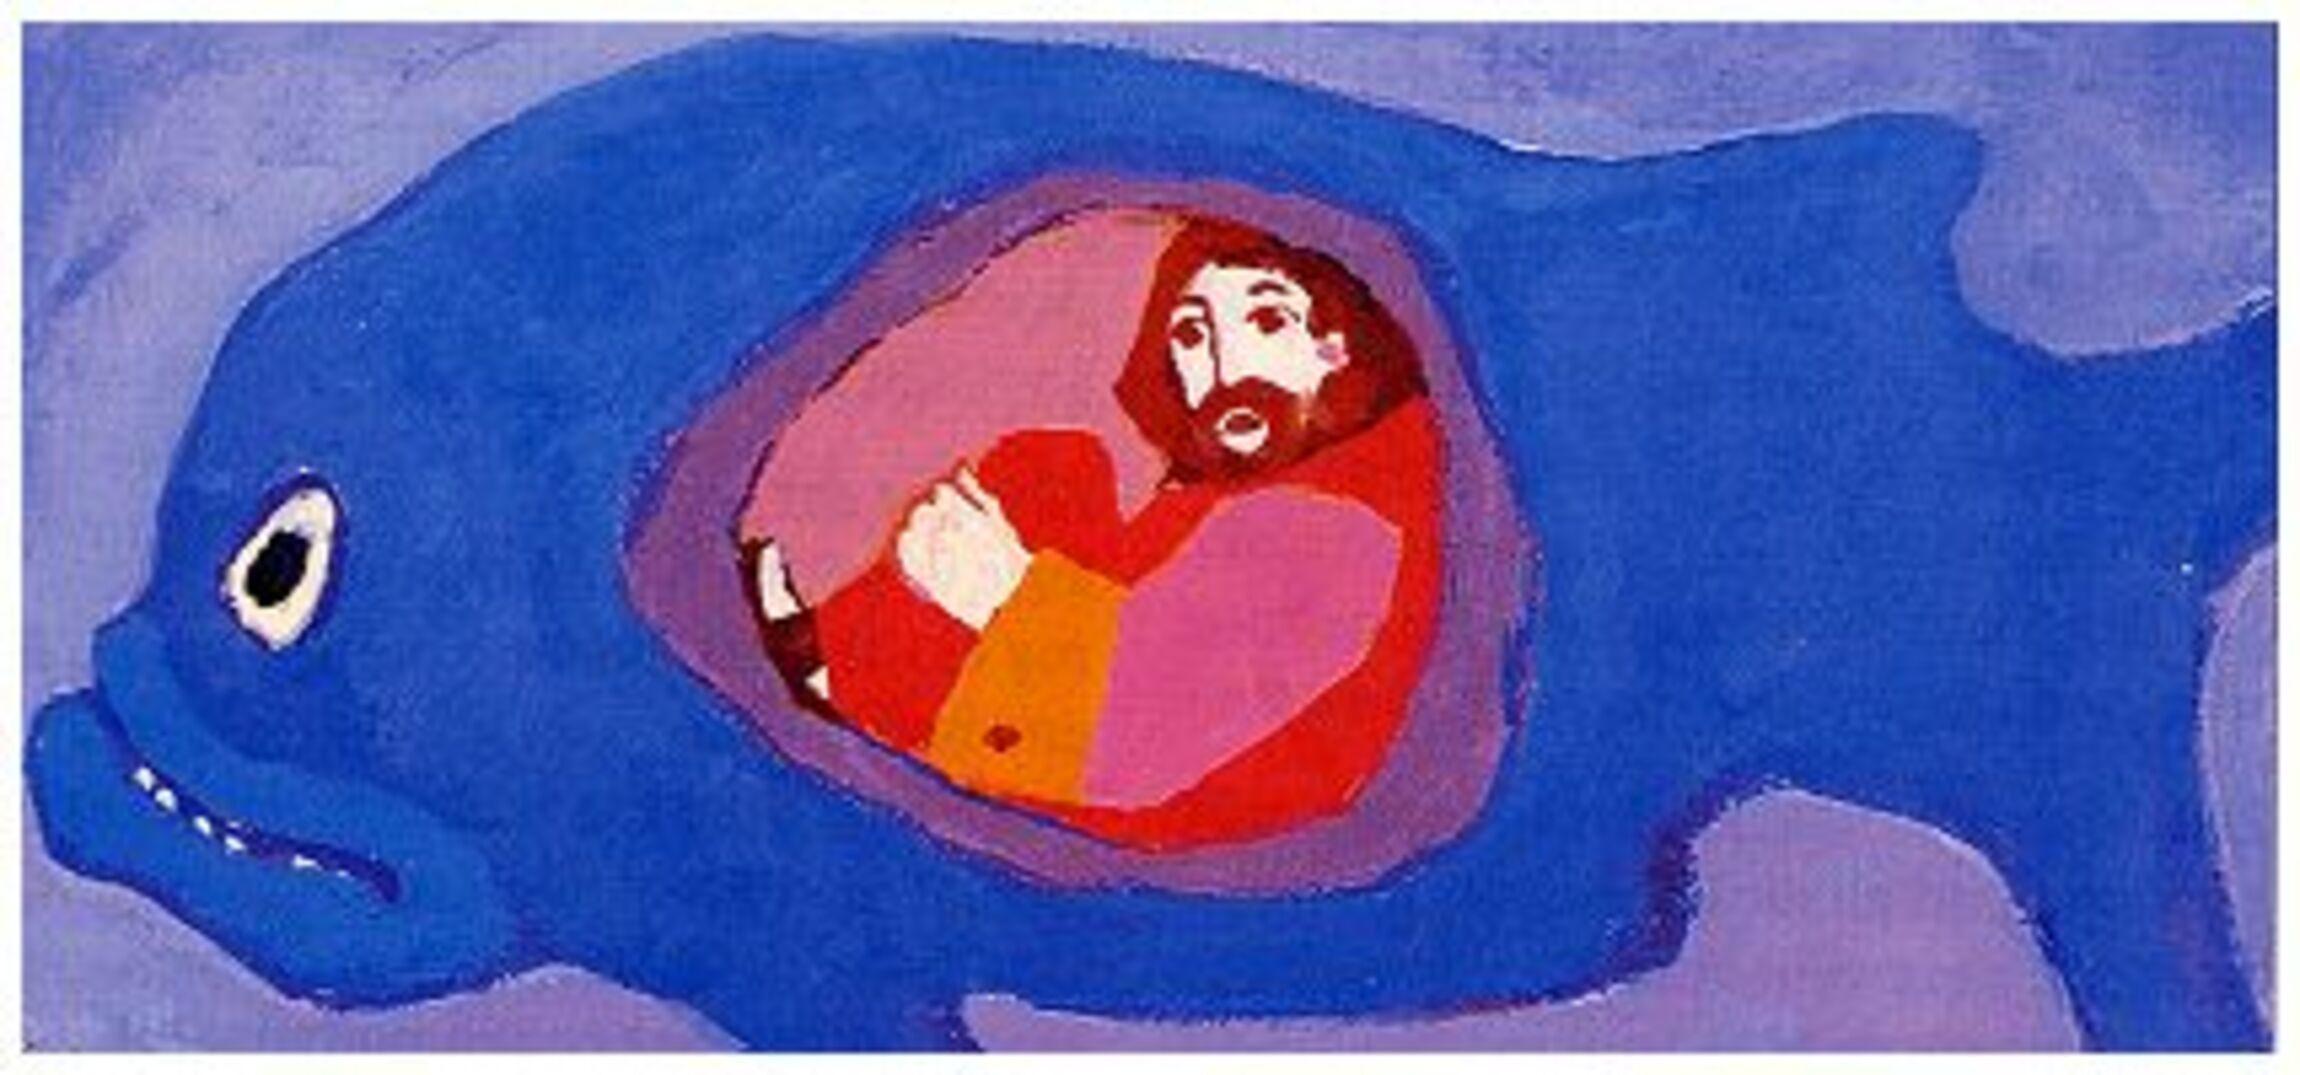 Kees de Kort - Jona im Bauch des Fischs - Neukirchener Kinderbibel